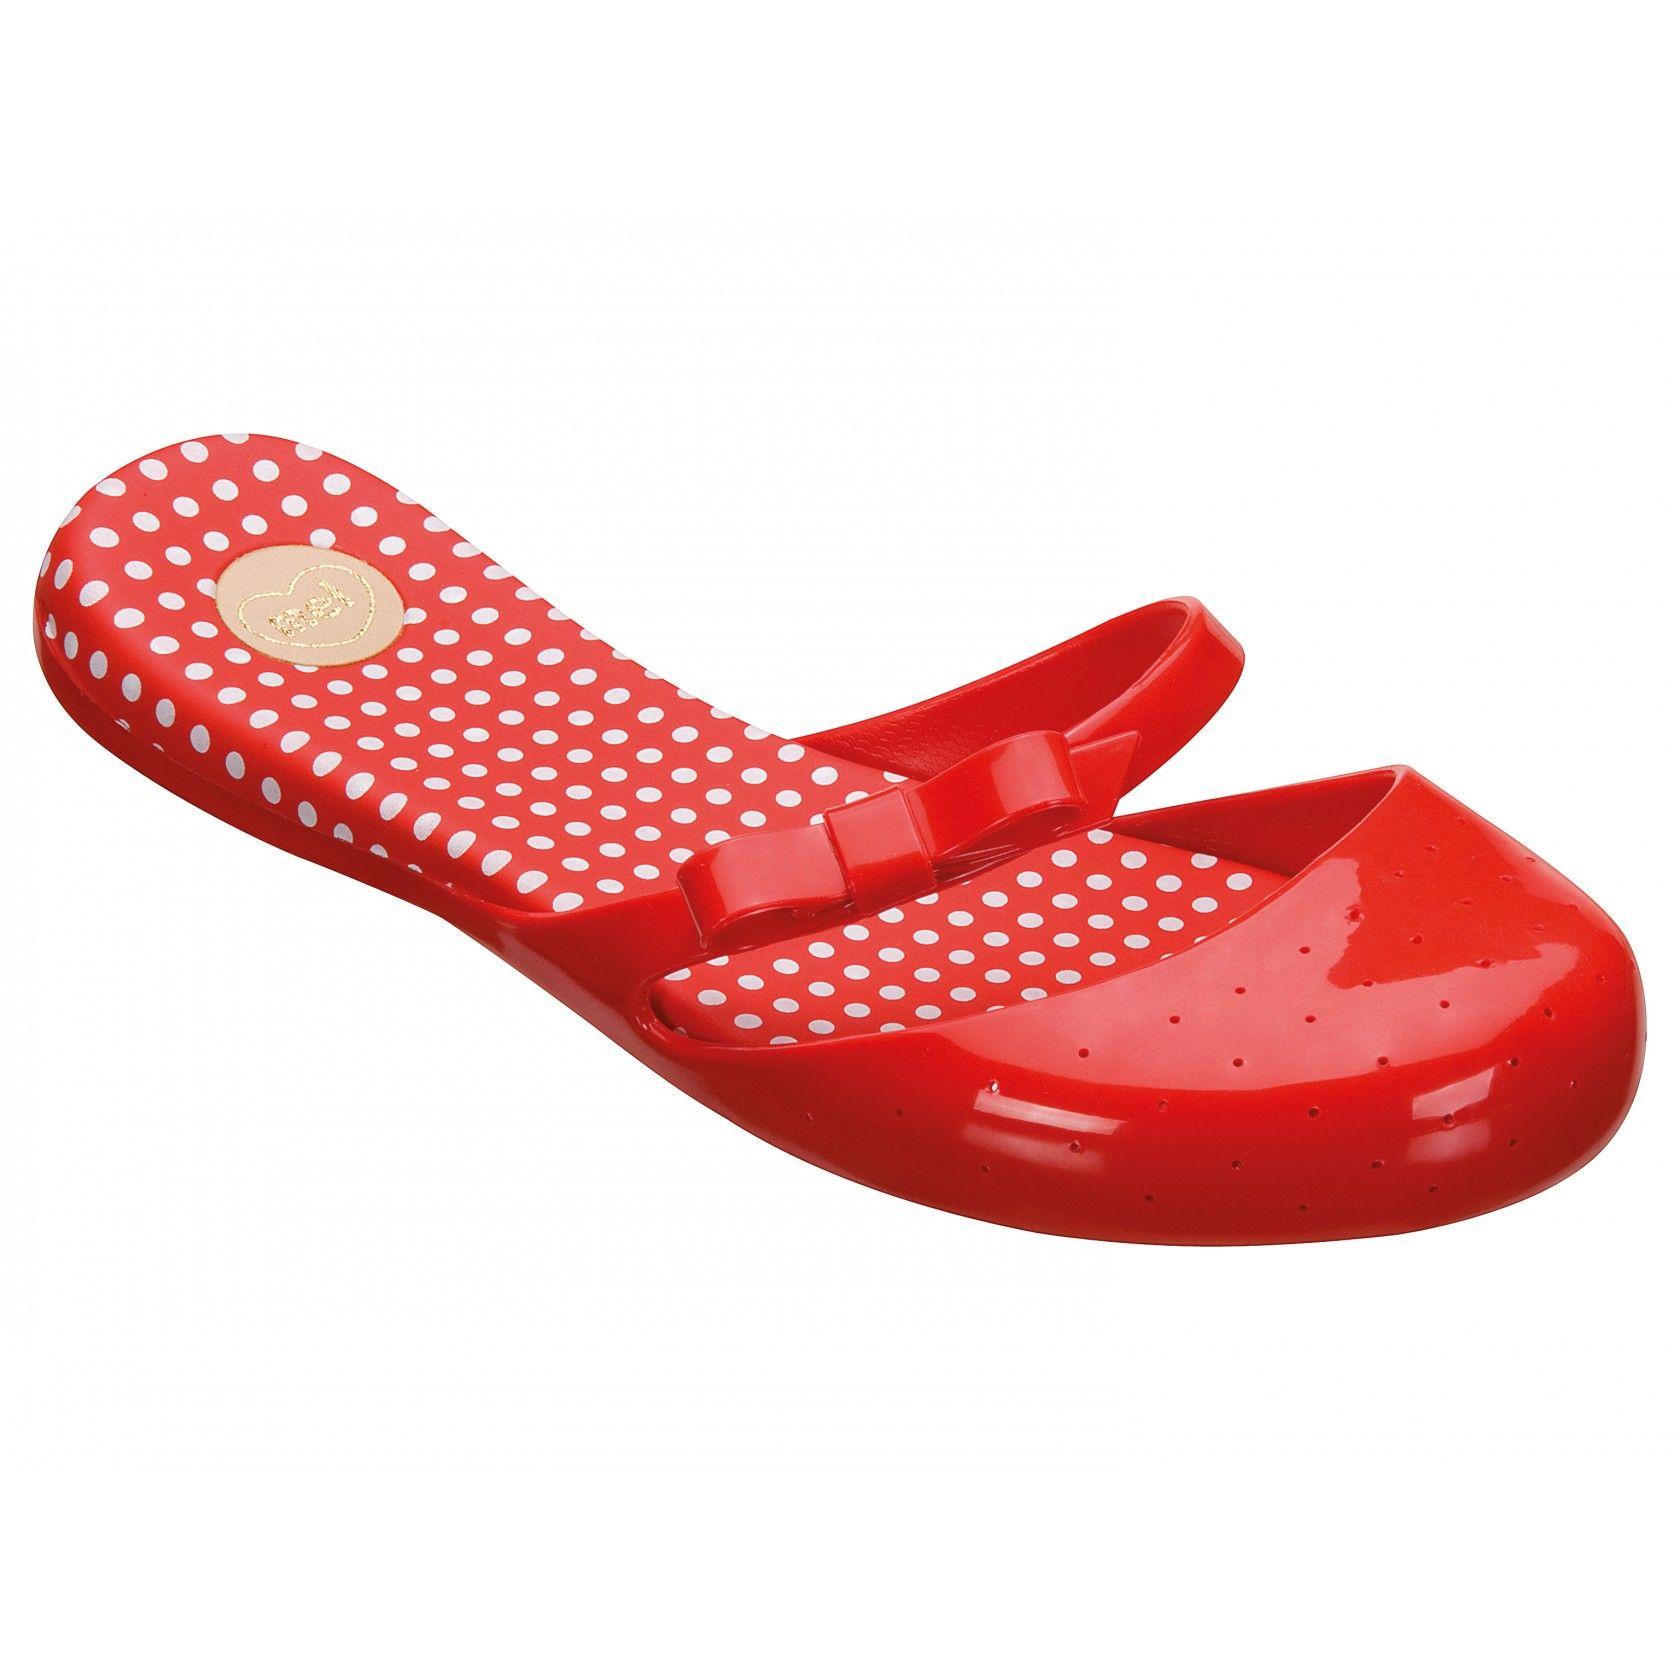 7b03e61a6c12a Mel Shoes by Melissa